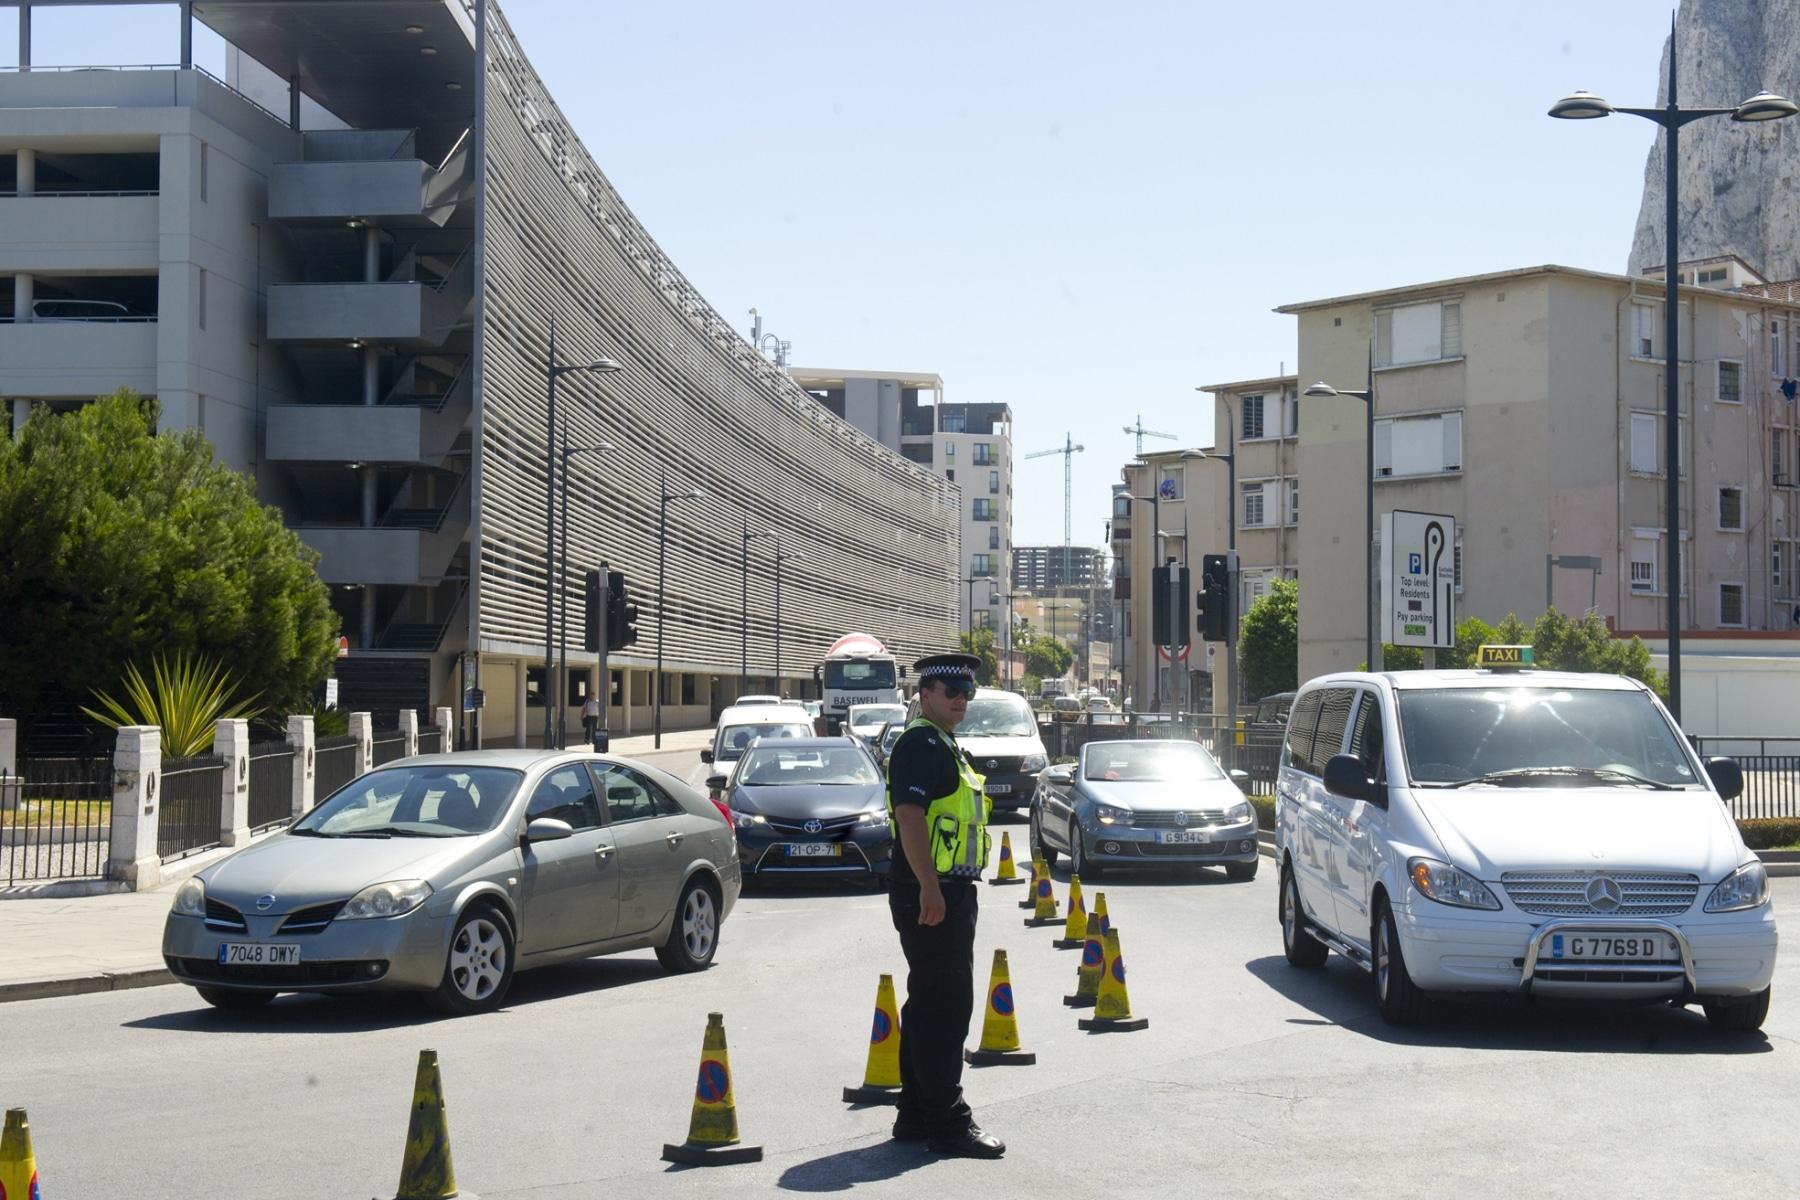 21-agosto-2014-colas-de-entrada-y-salida-de-gibraltar13_14989737105_o